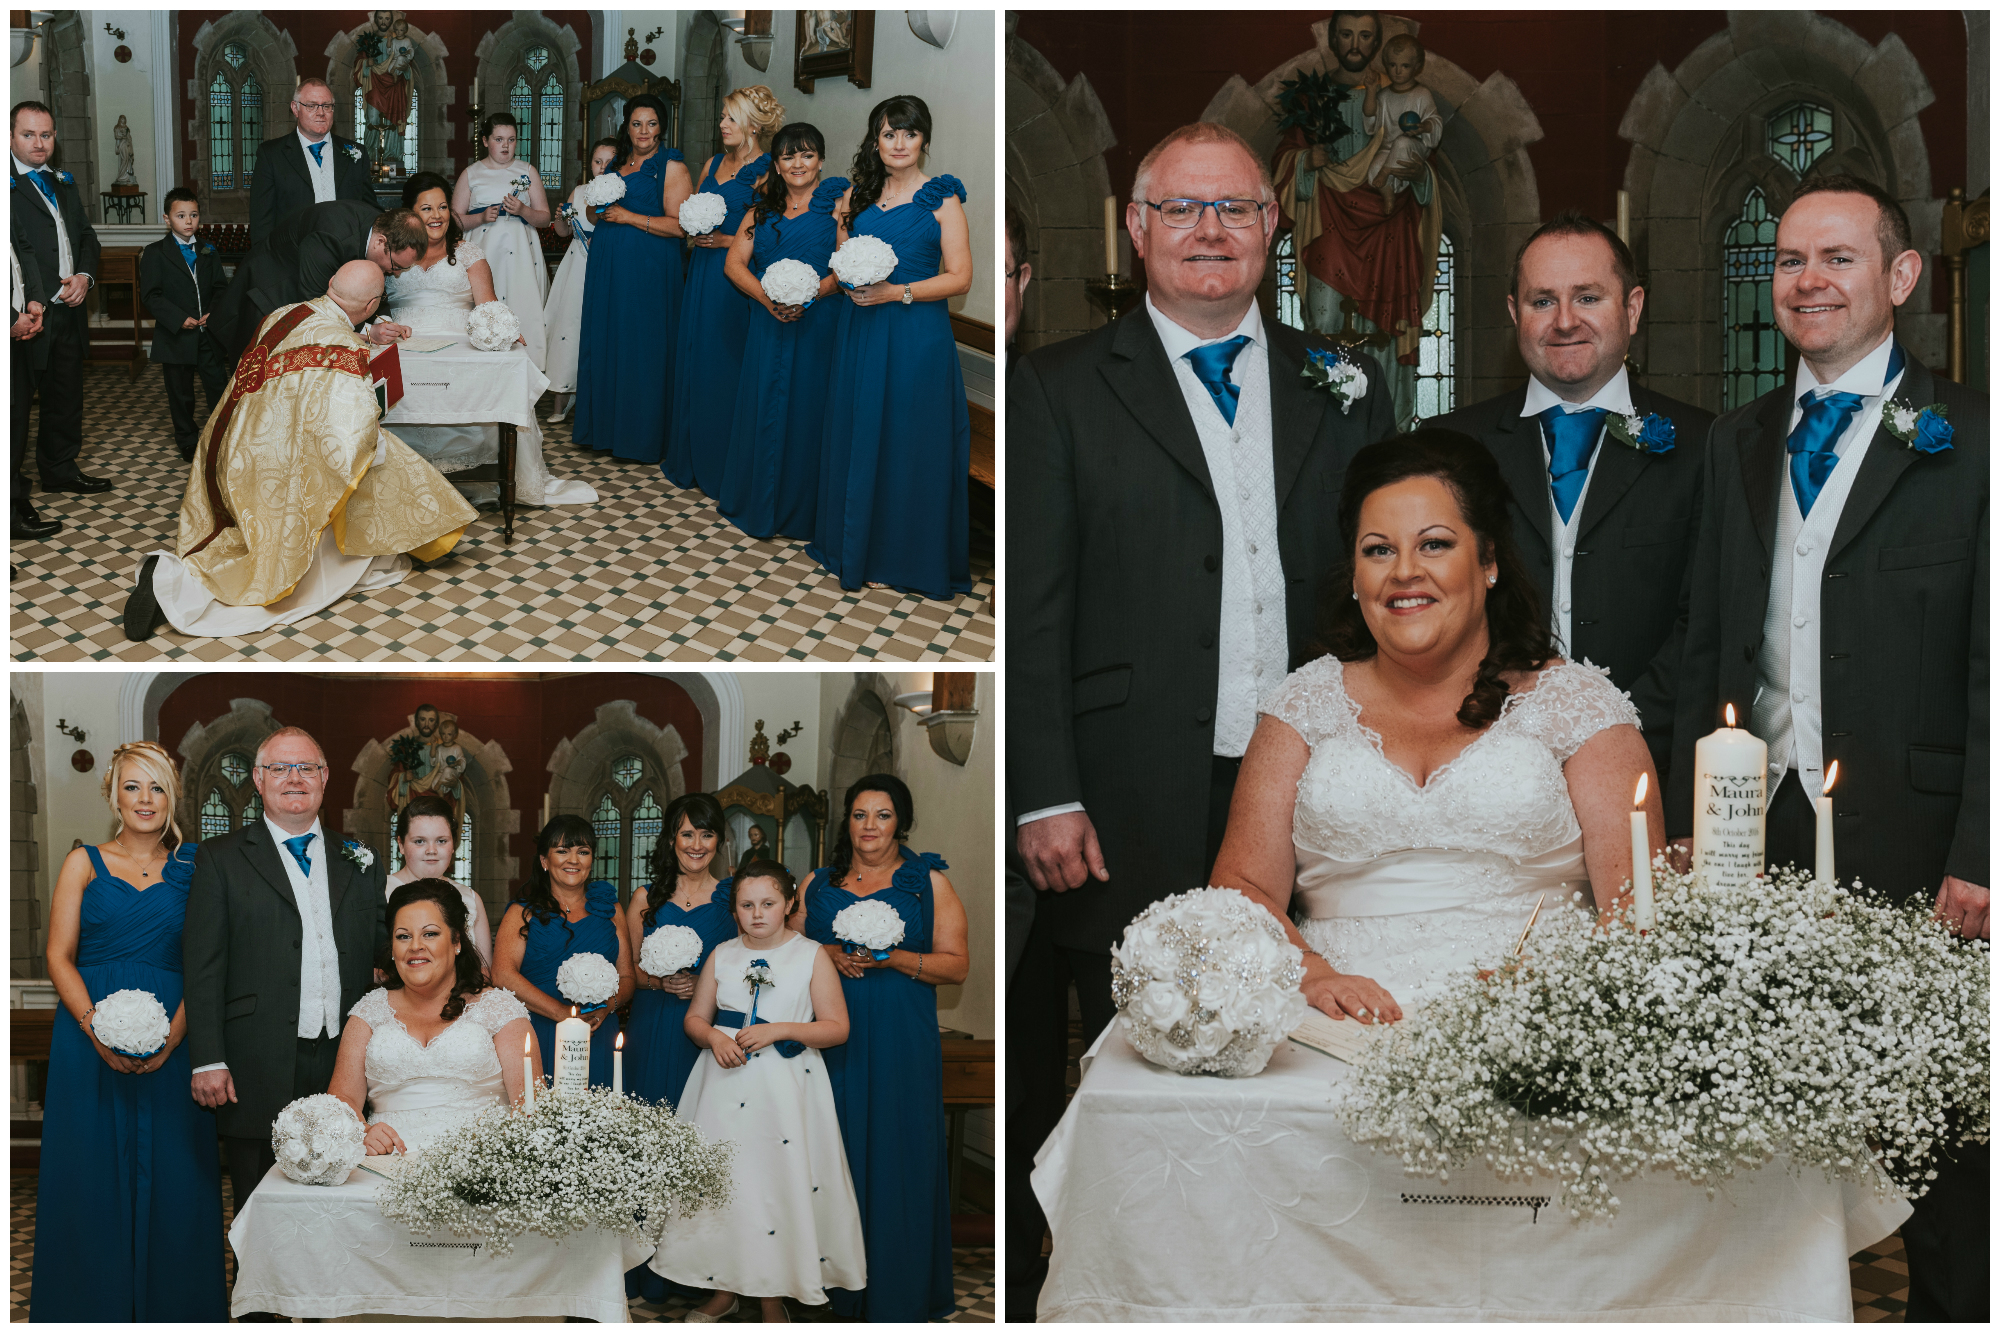 St. Pauls belfast wedding photographer pure photo n.i signing